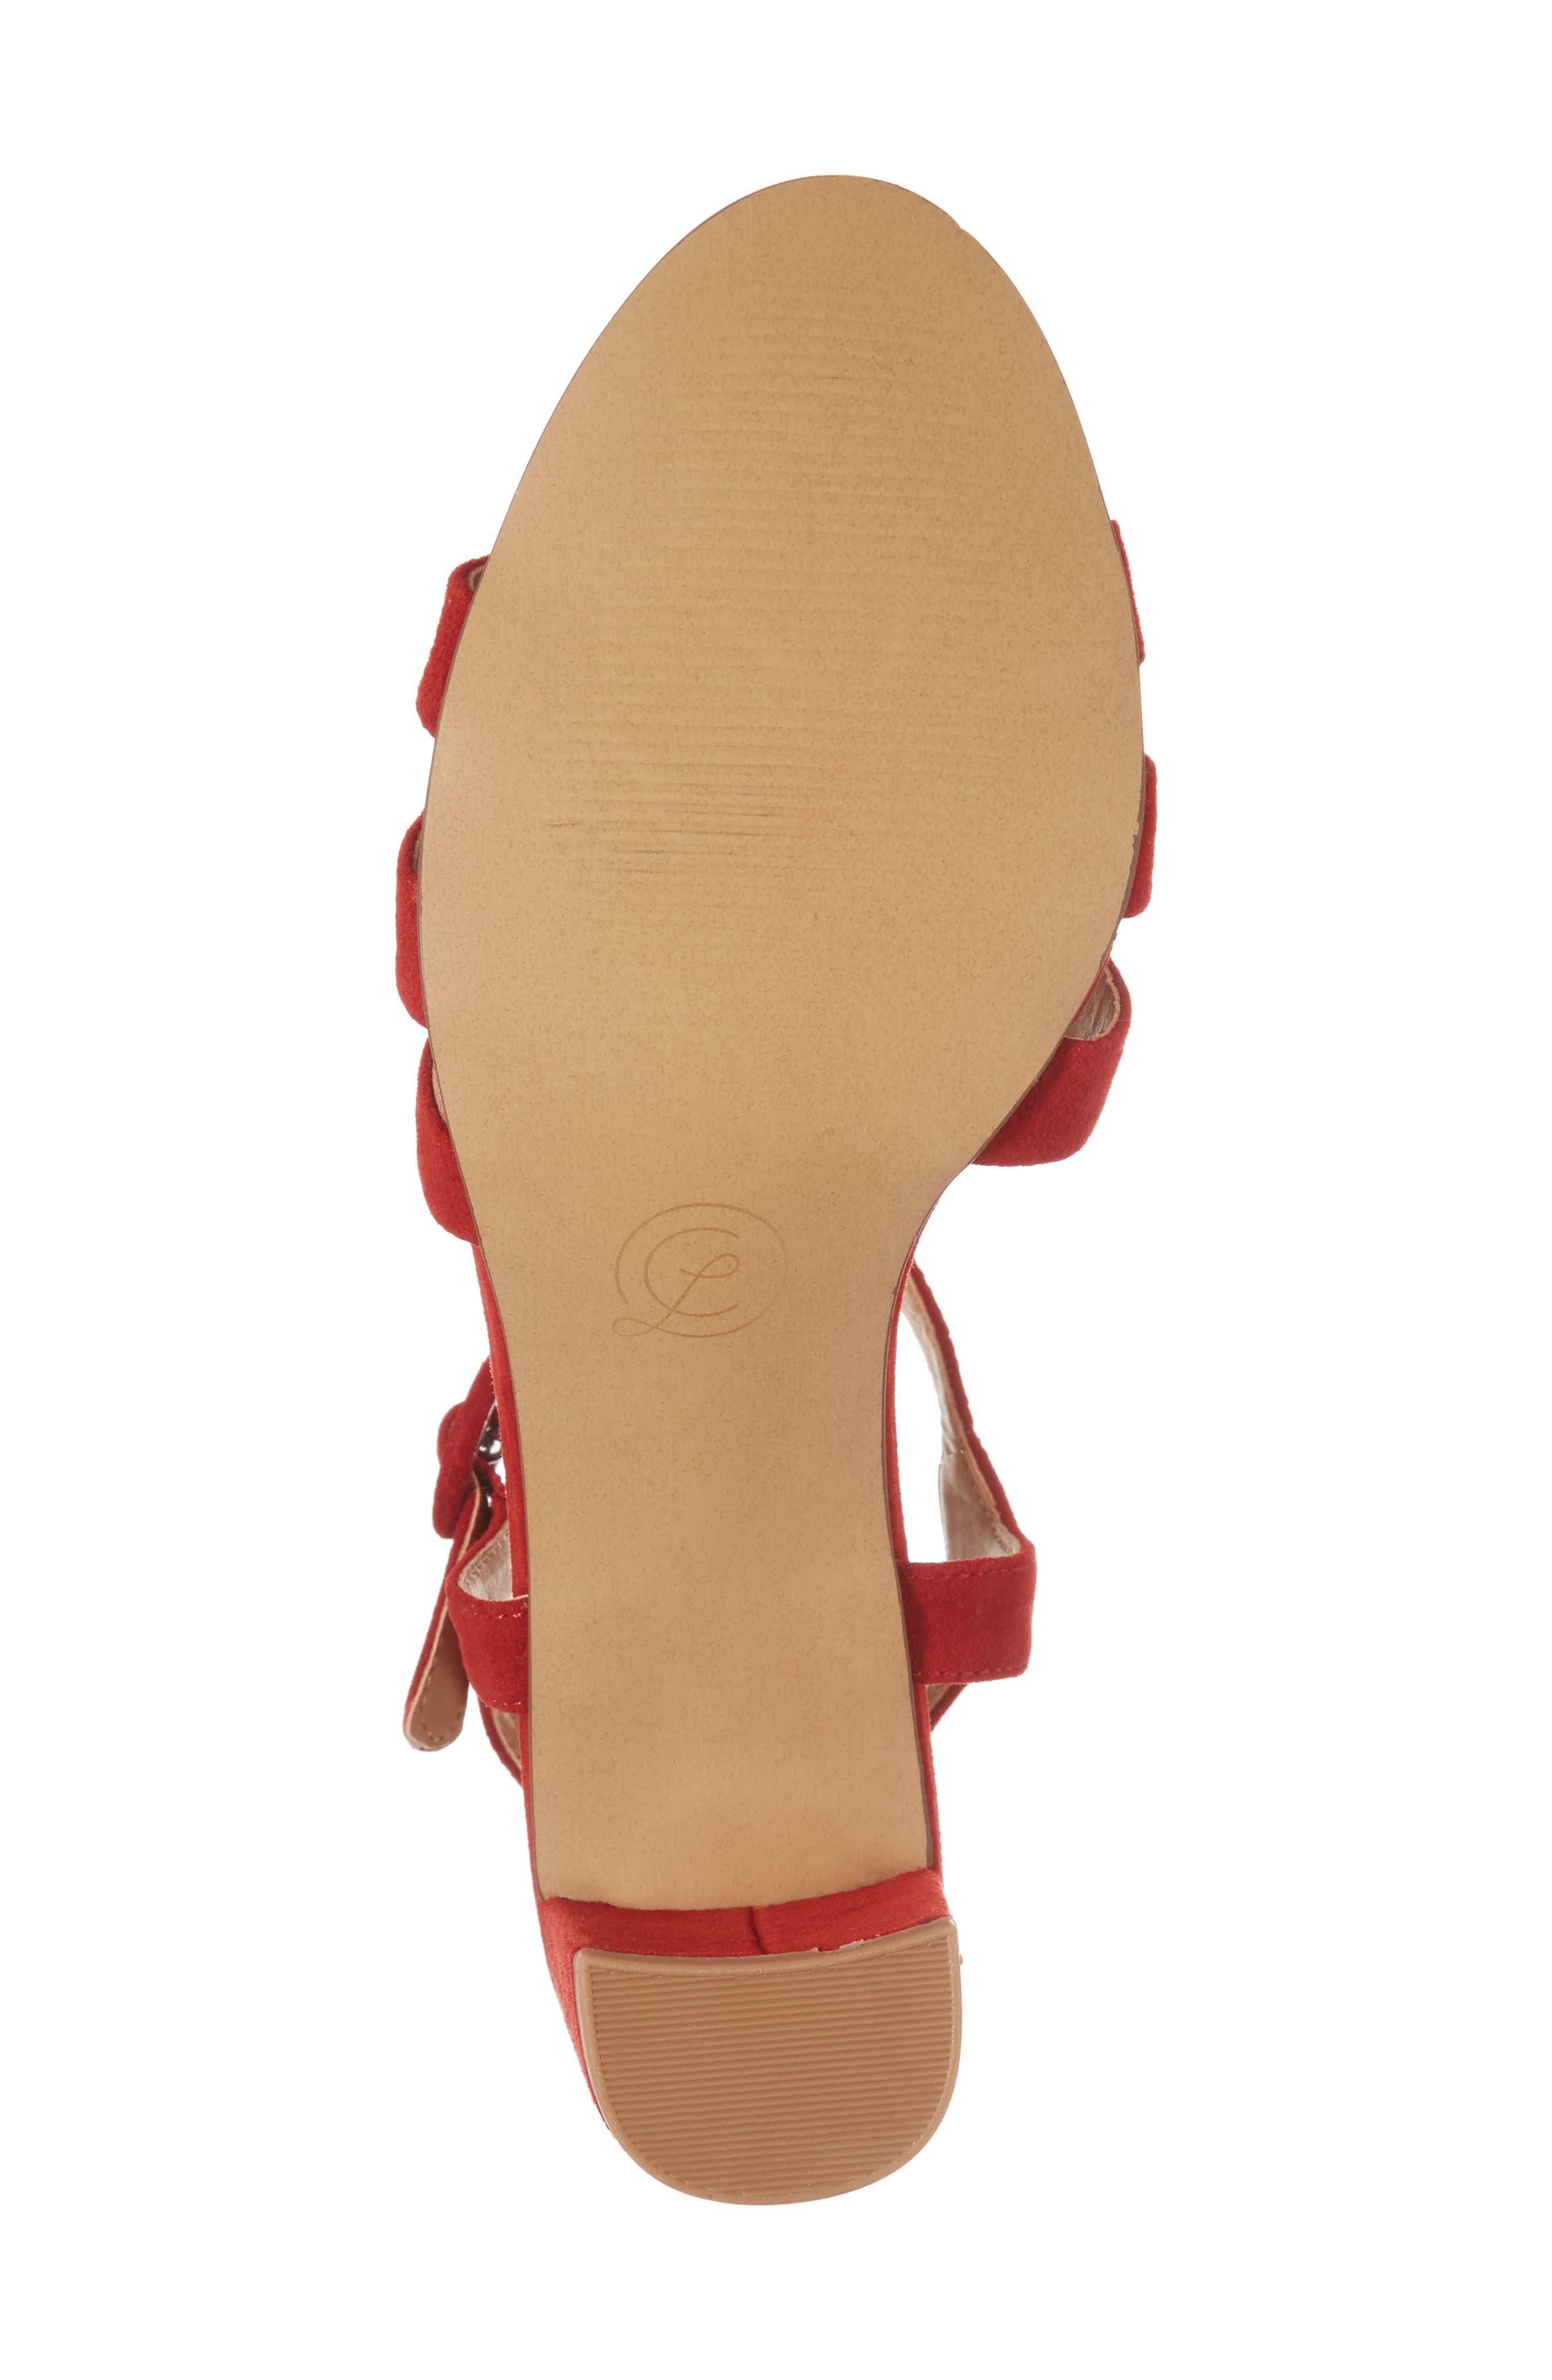 Ryden Strappy Sandal,                             Alternate thumbnail 6, color,                             Red